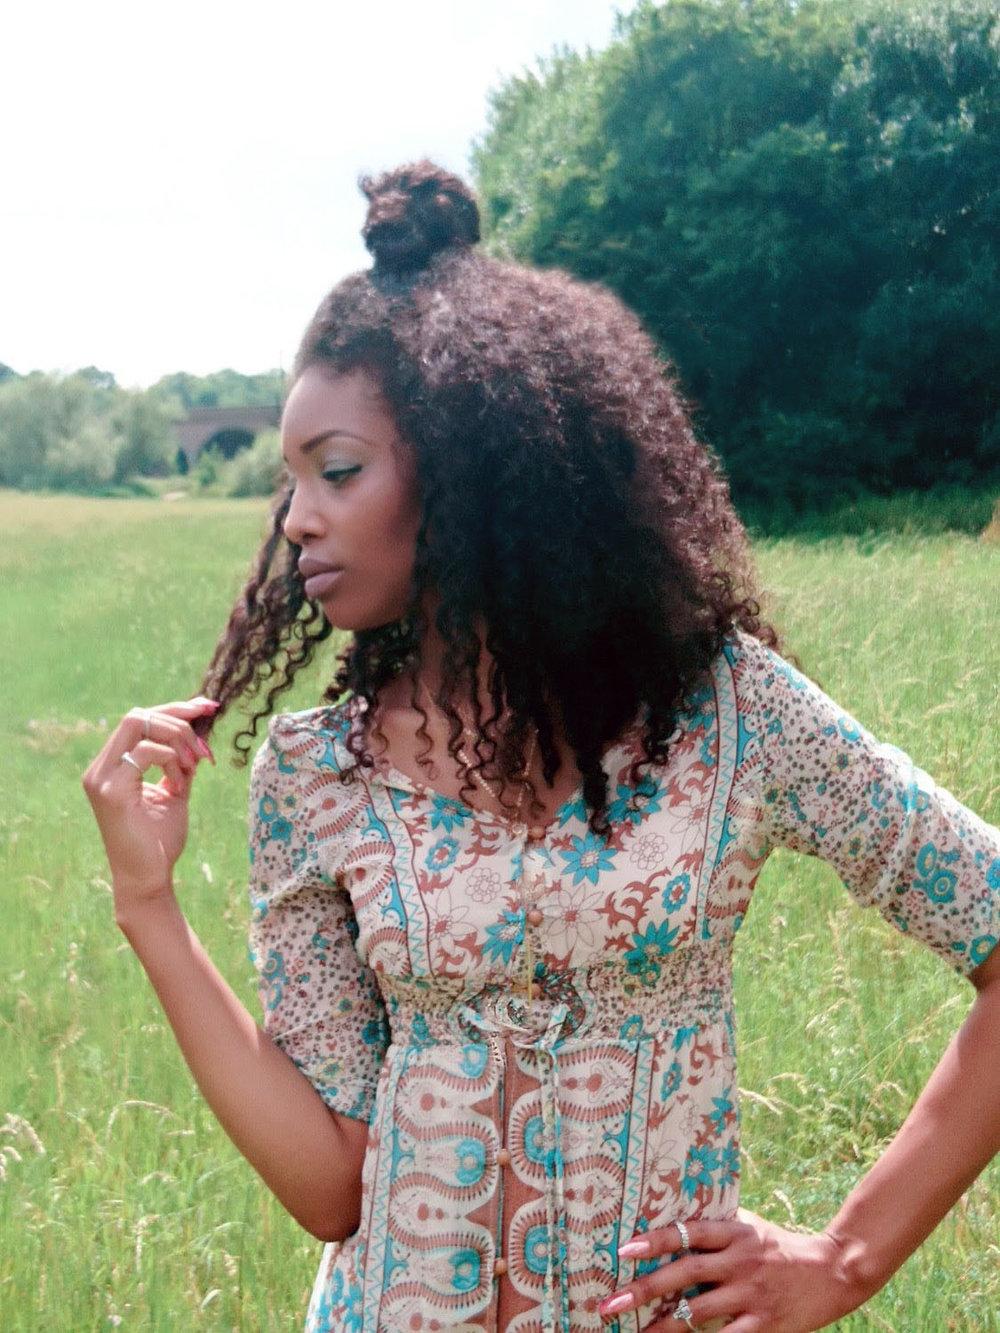 Curly hair, green dress